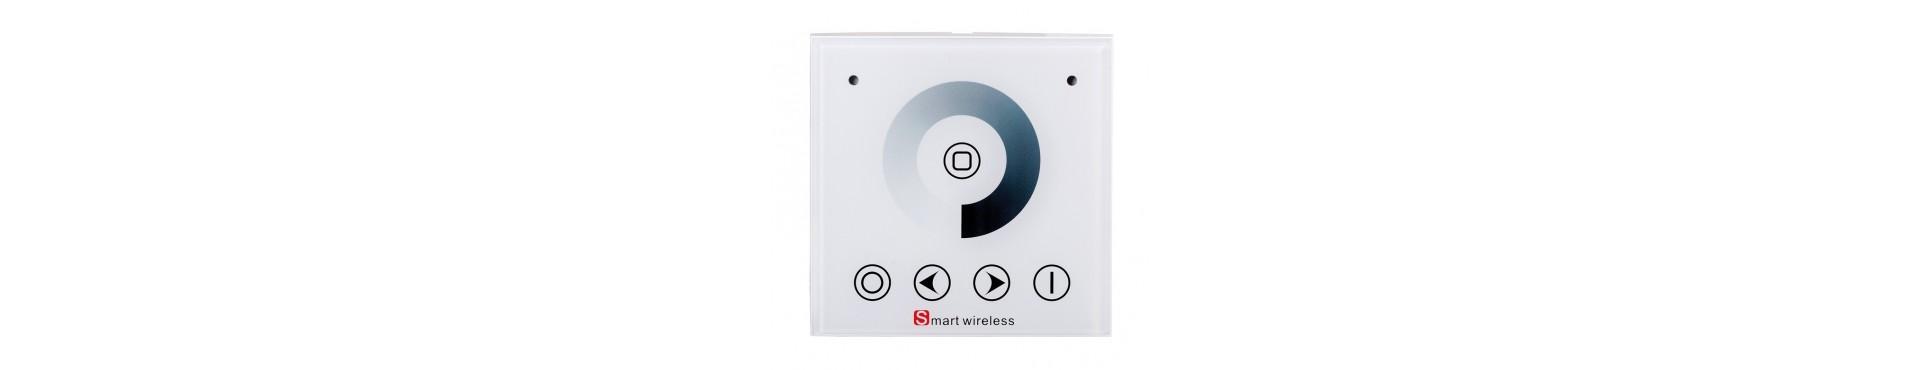 Intelligente styresystemer til led belysning 2,4Ghz